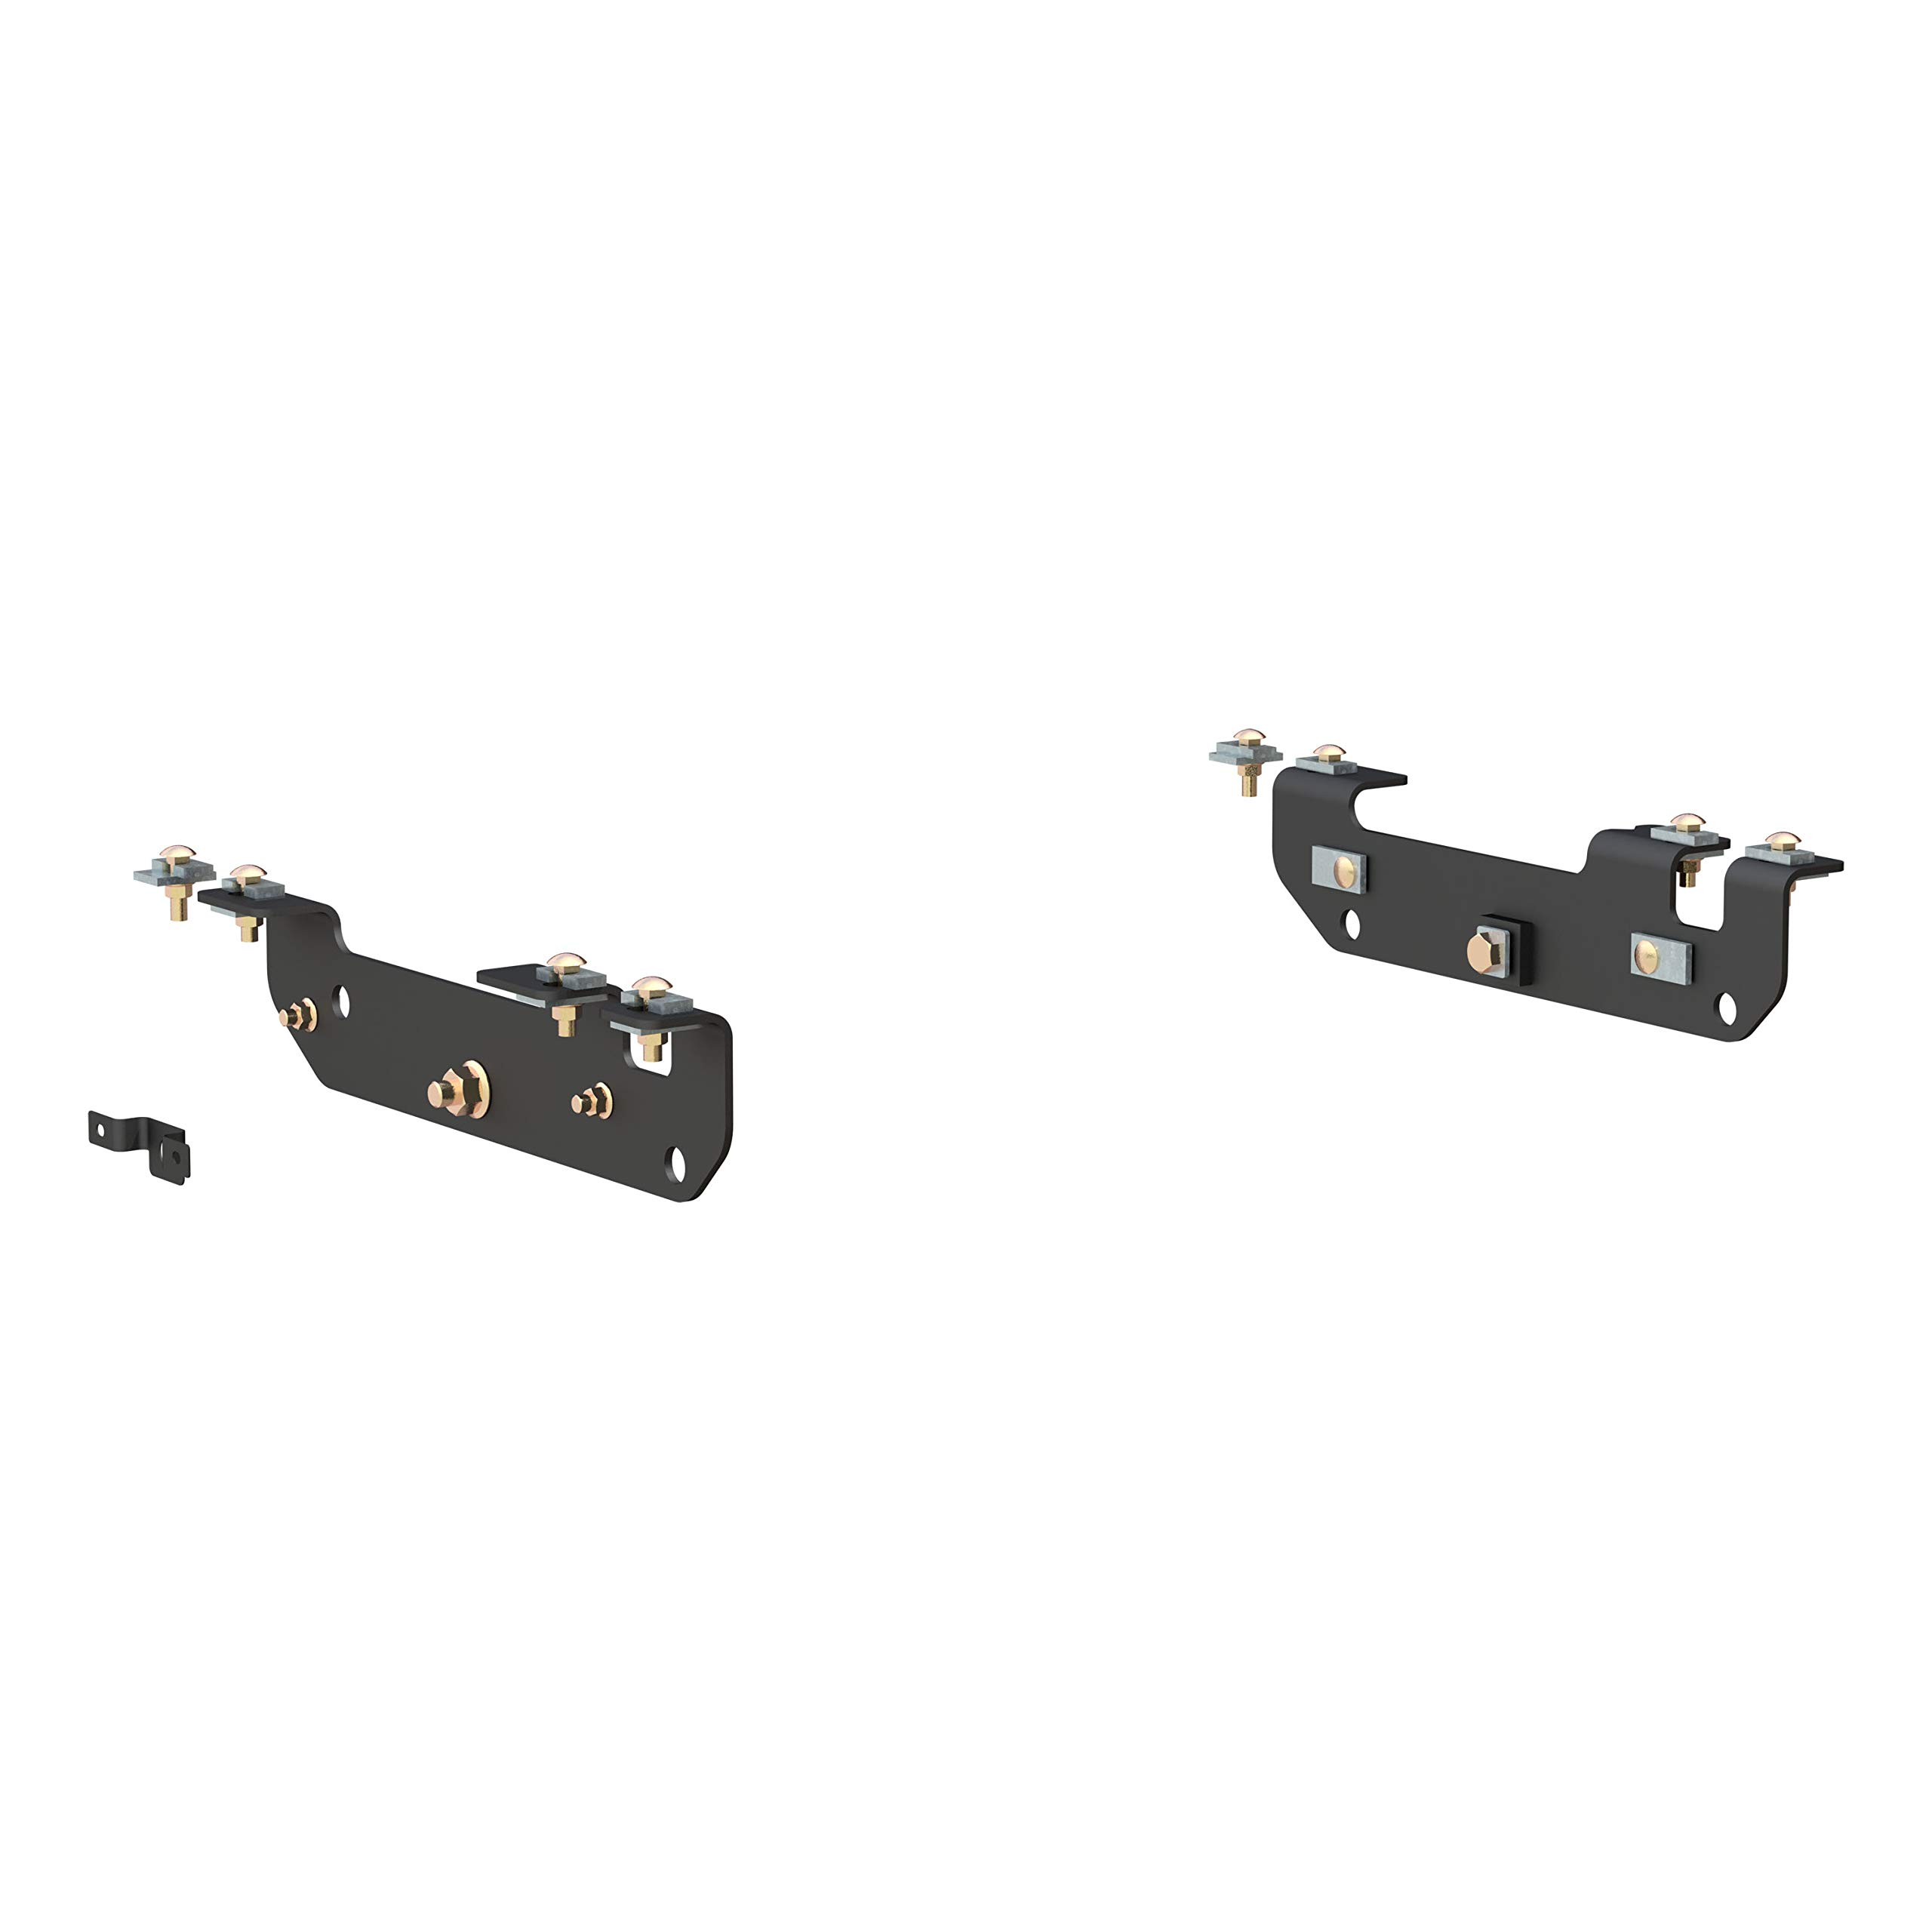 CURT 16424 Black 5th Wheel Hitch Installation Brackets for Select Ford F-250, F-350, F-450 Super Duty by CURT